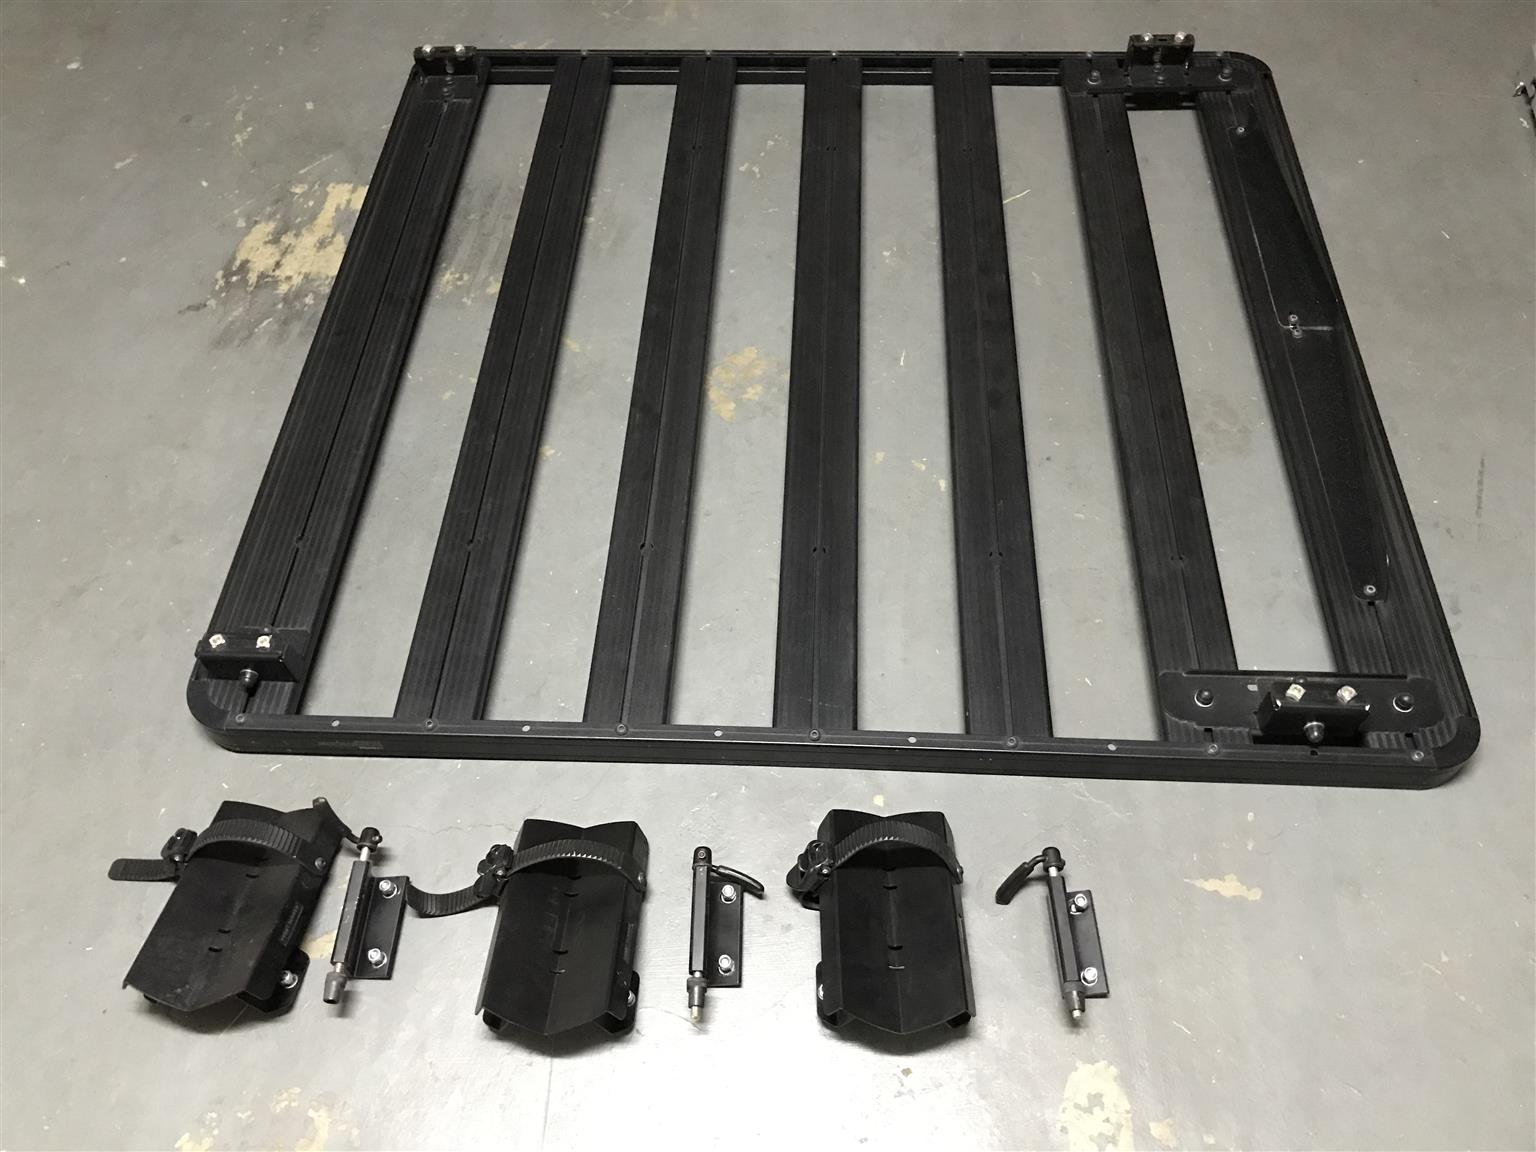 Front Runner Roof rack with 3 bike rack